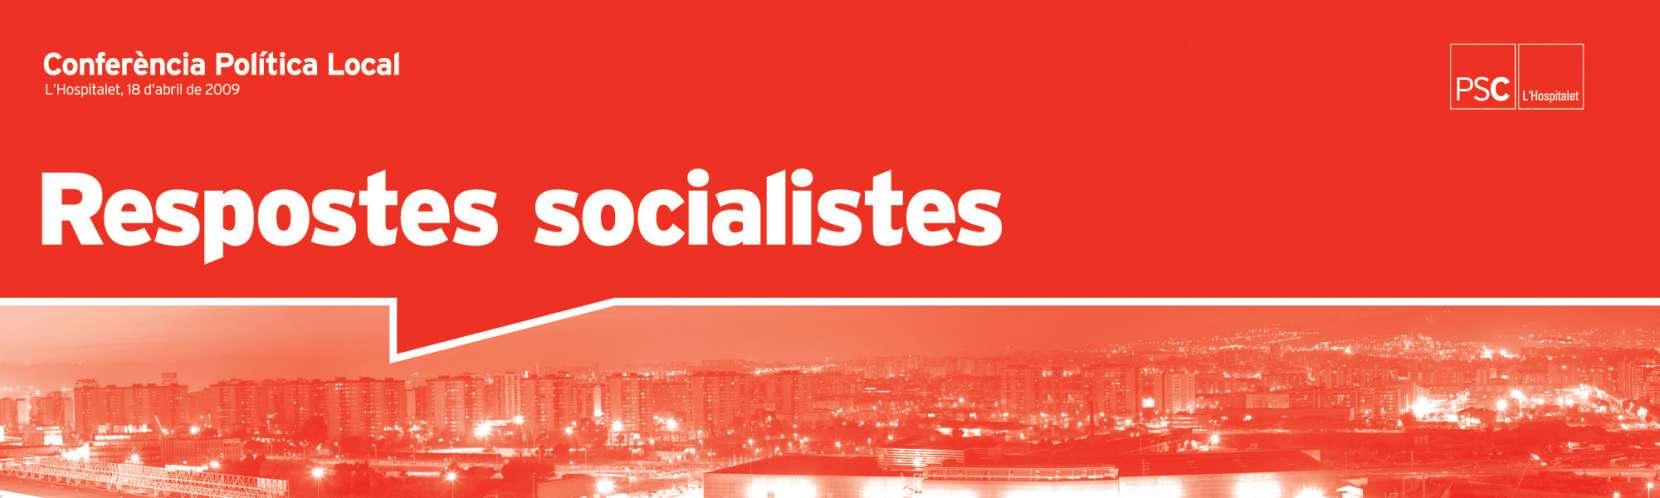 PSC-RESPOSTES-SOCIALISTES-1.jpg